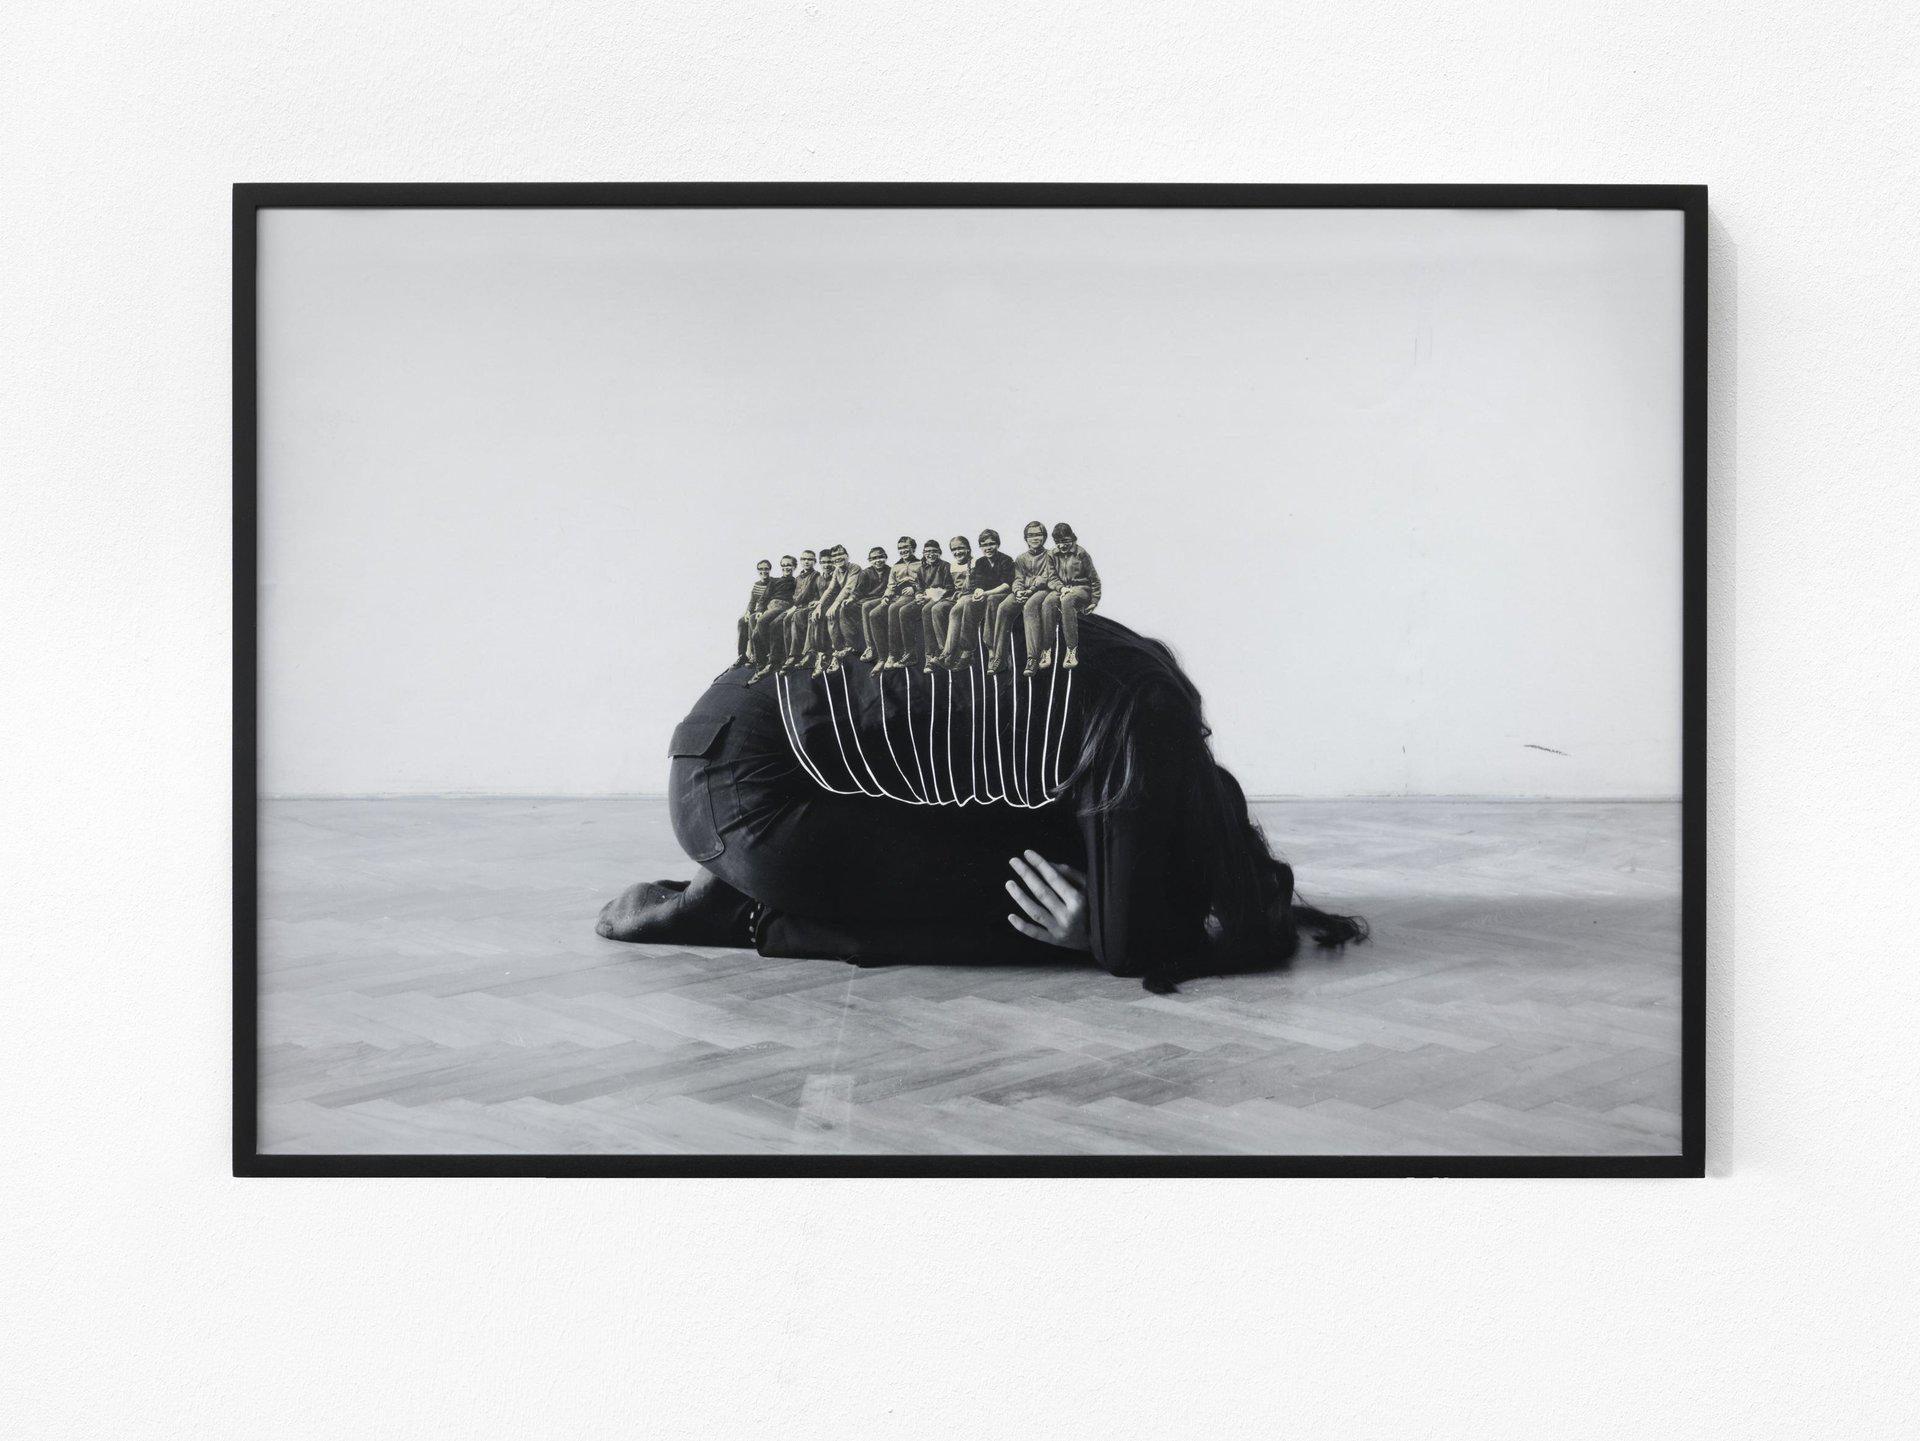 Eva Kot'átková, Untitled (Theatre of Speaking Objects), 2012